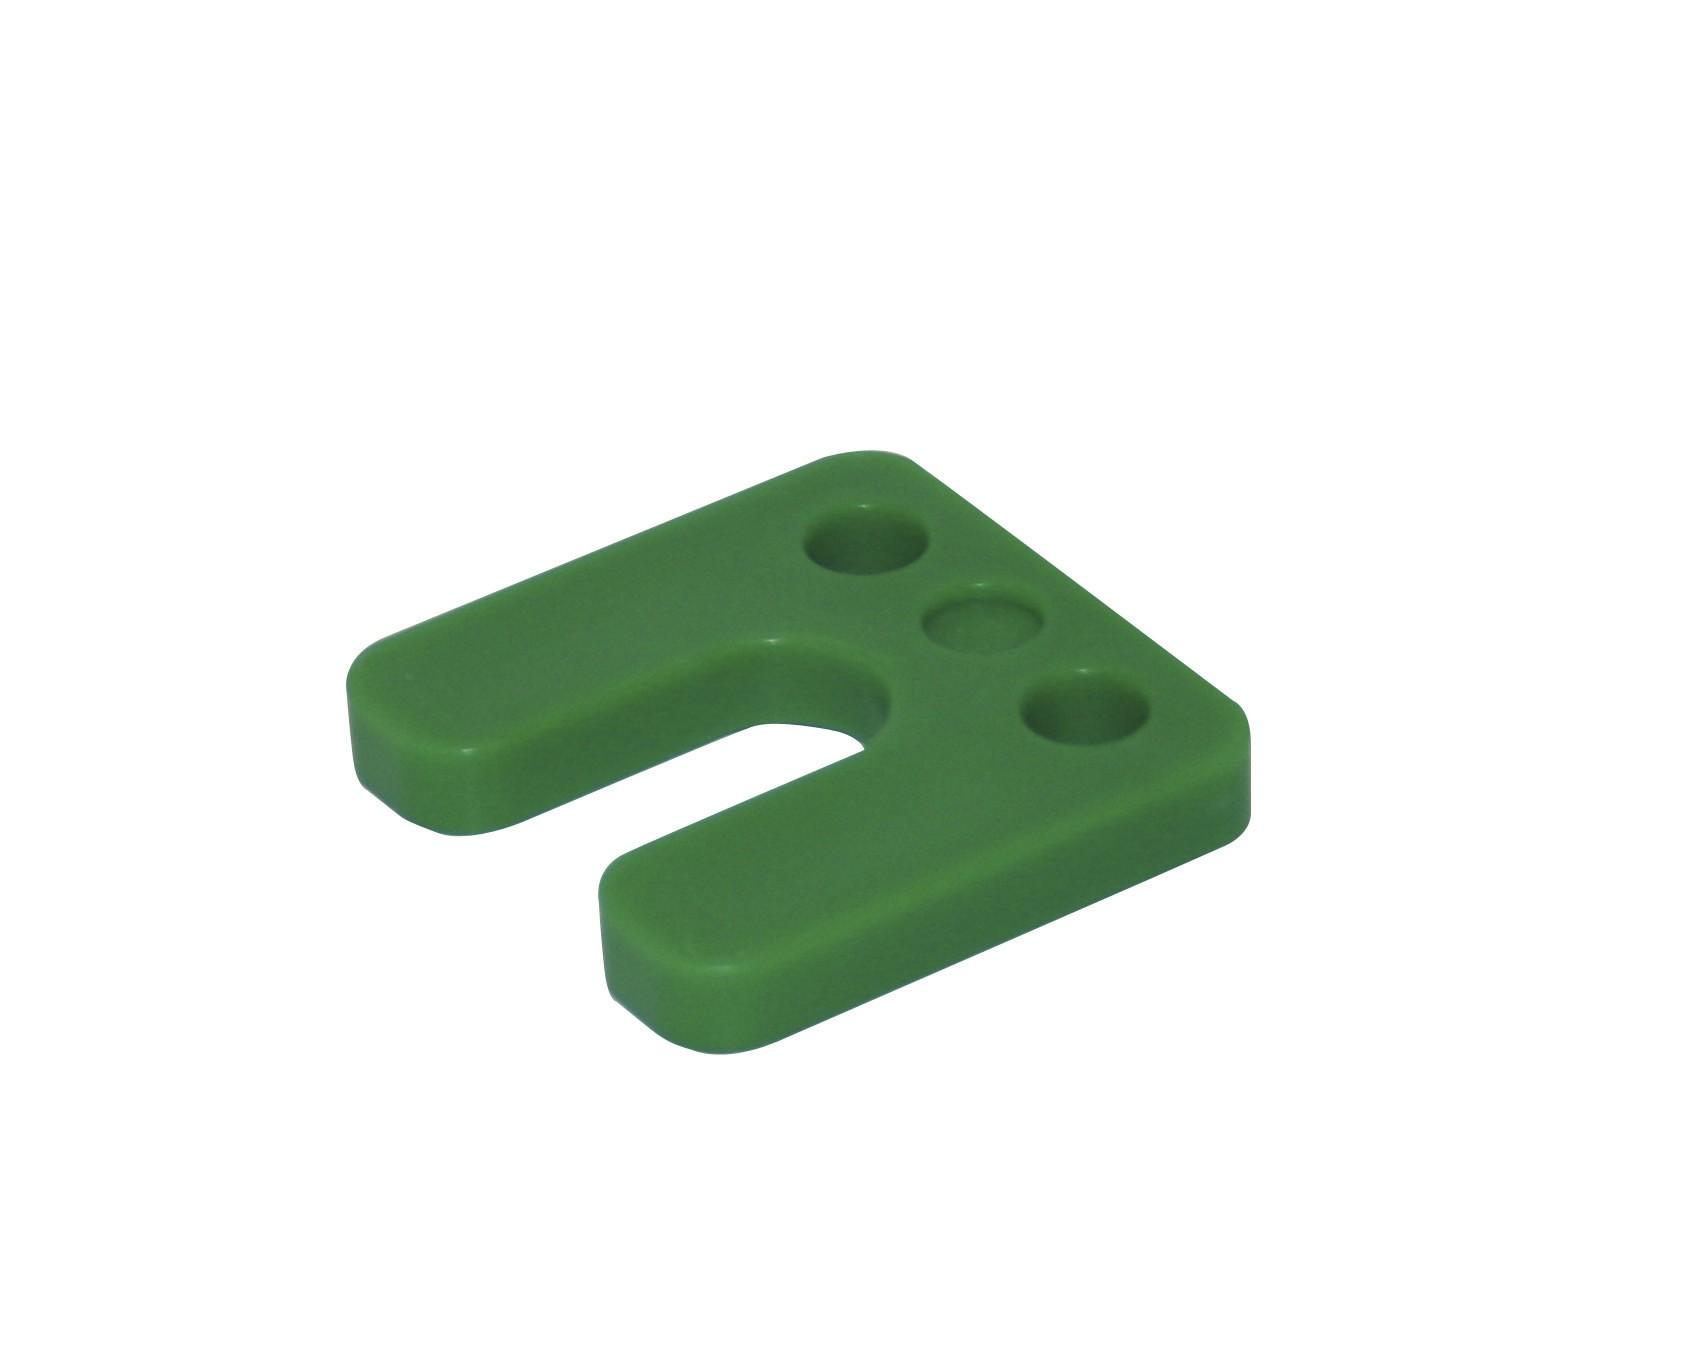 Plaques de pression avec rainure vert 10 70x70 KS